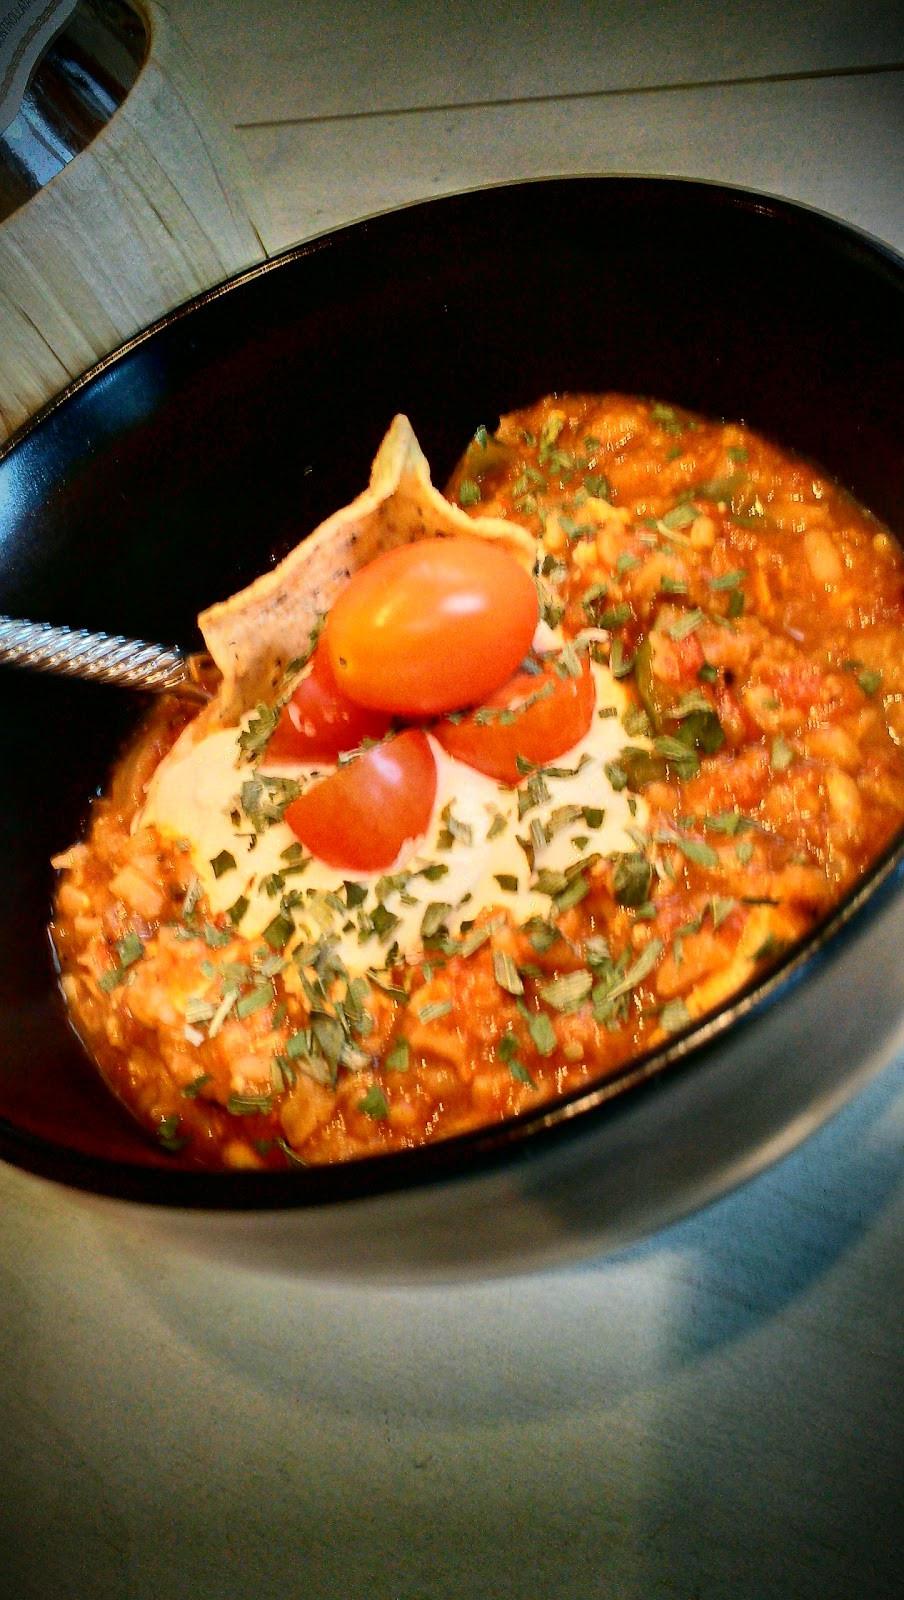 Crockpot Chili Vegetarian  Cousins in the Kitchen Crock Pot Ve arian Chili